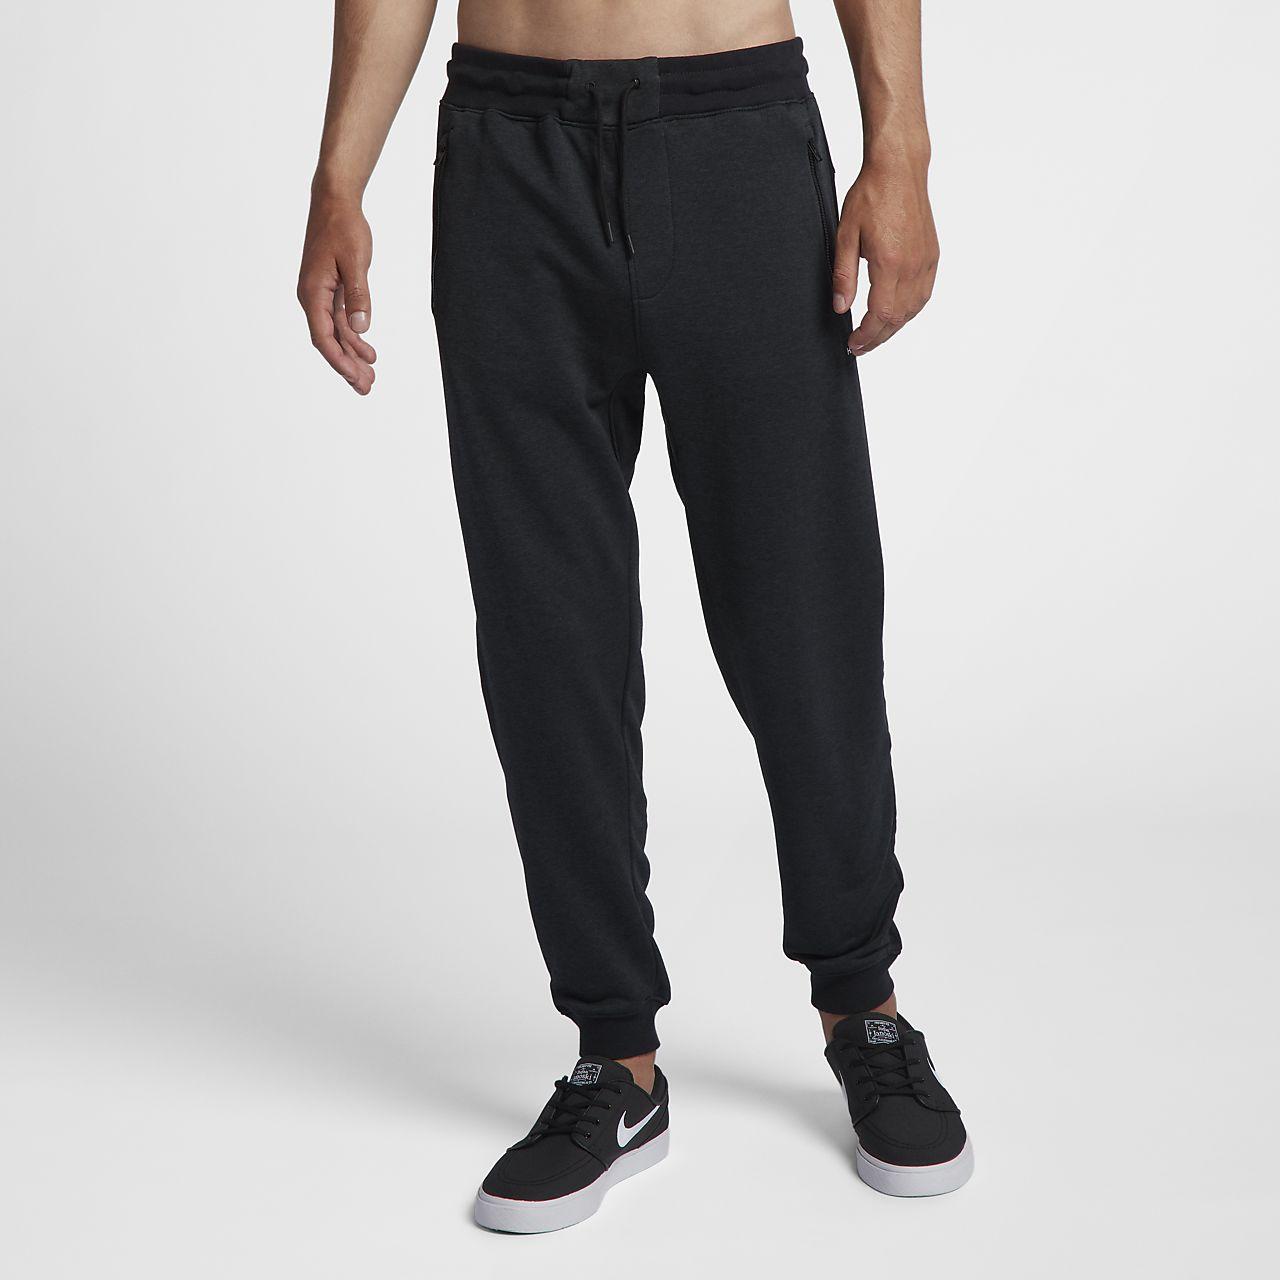 Hurley Dri-FIT Disperse Men's Pants